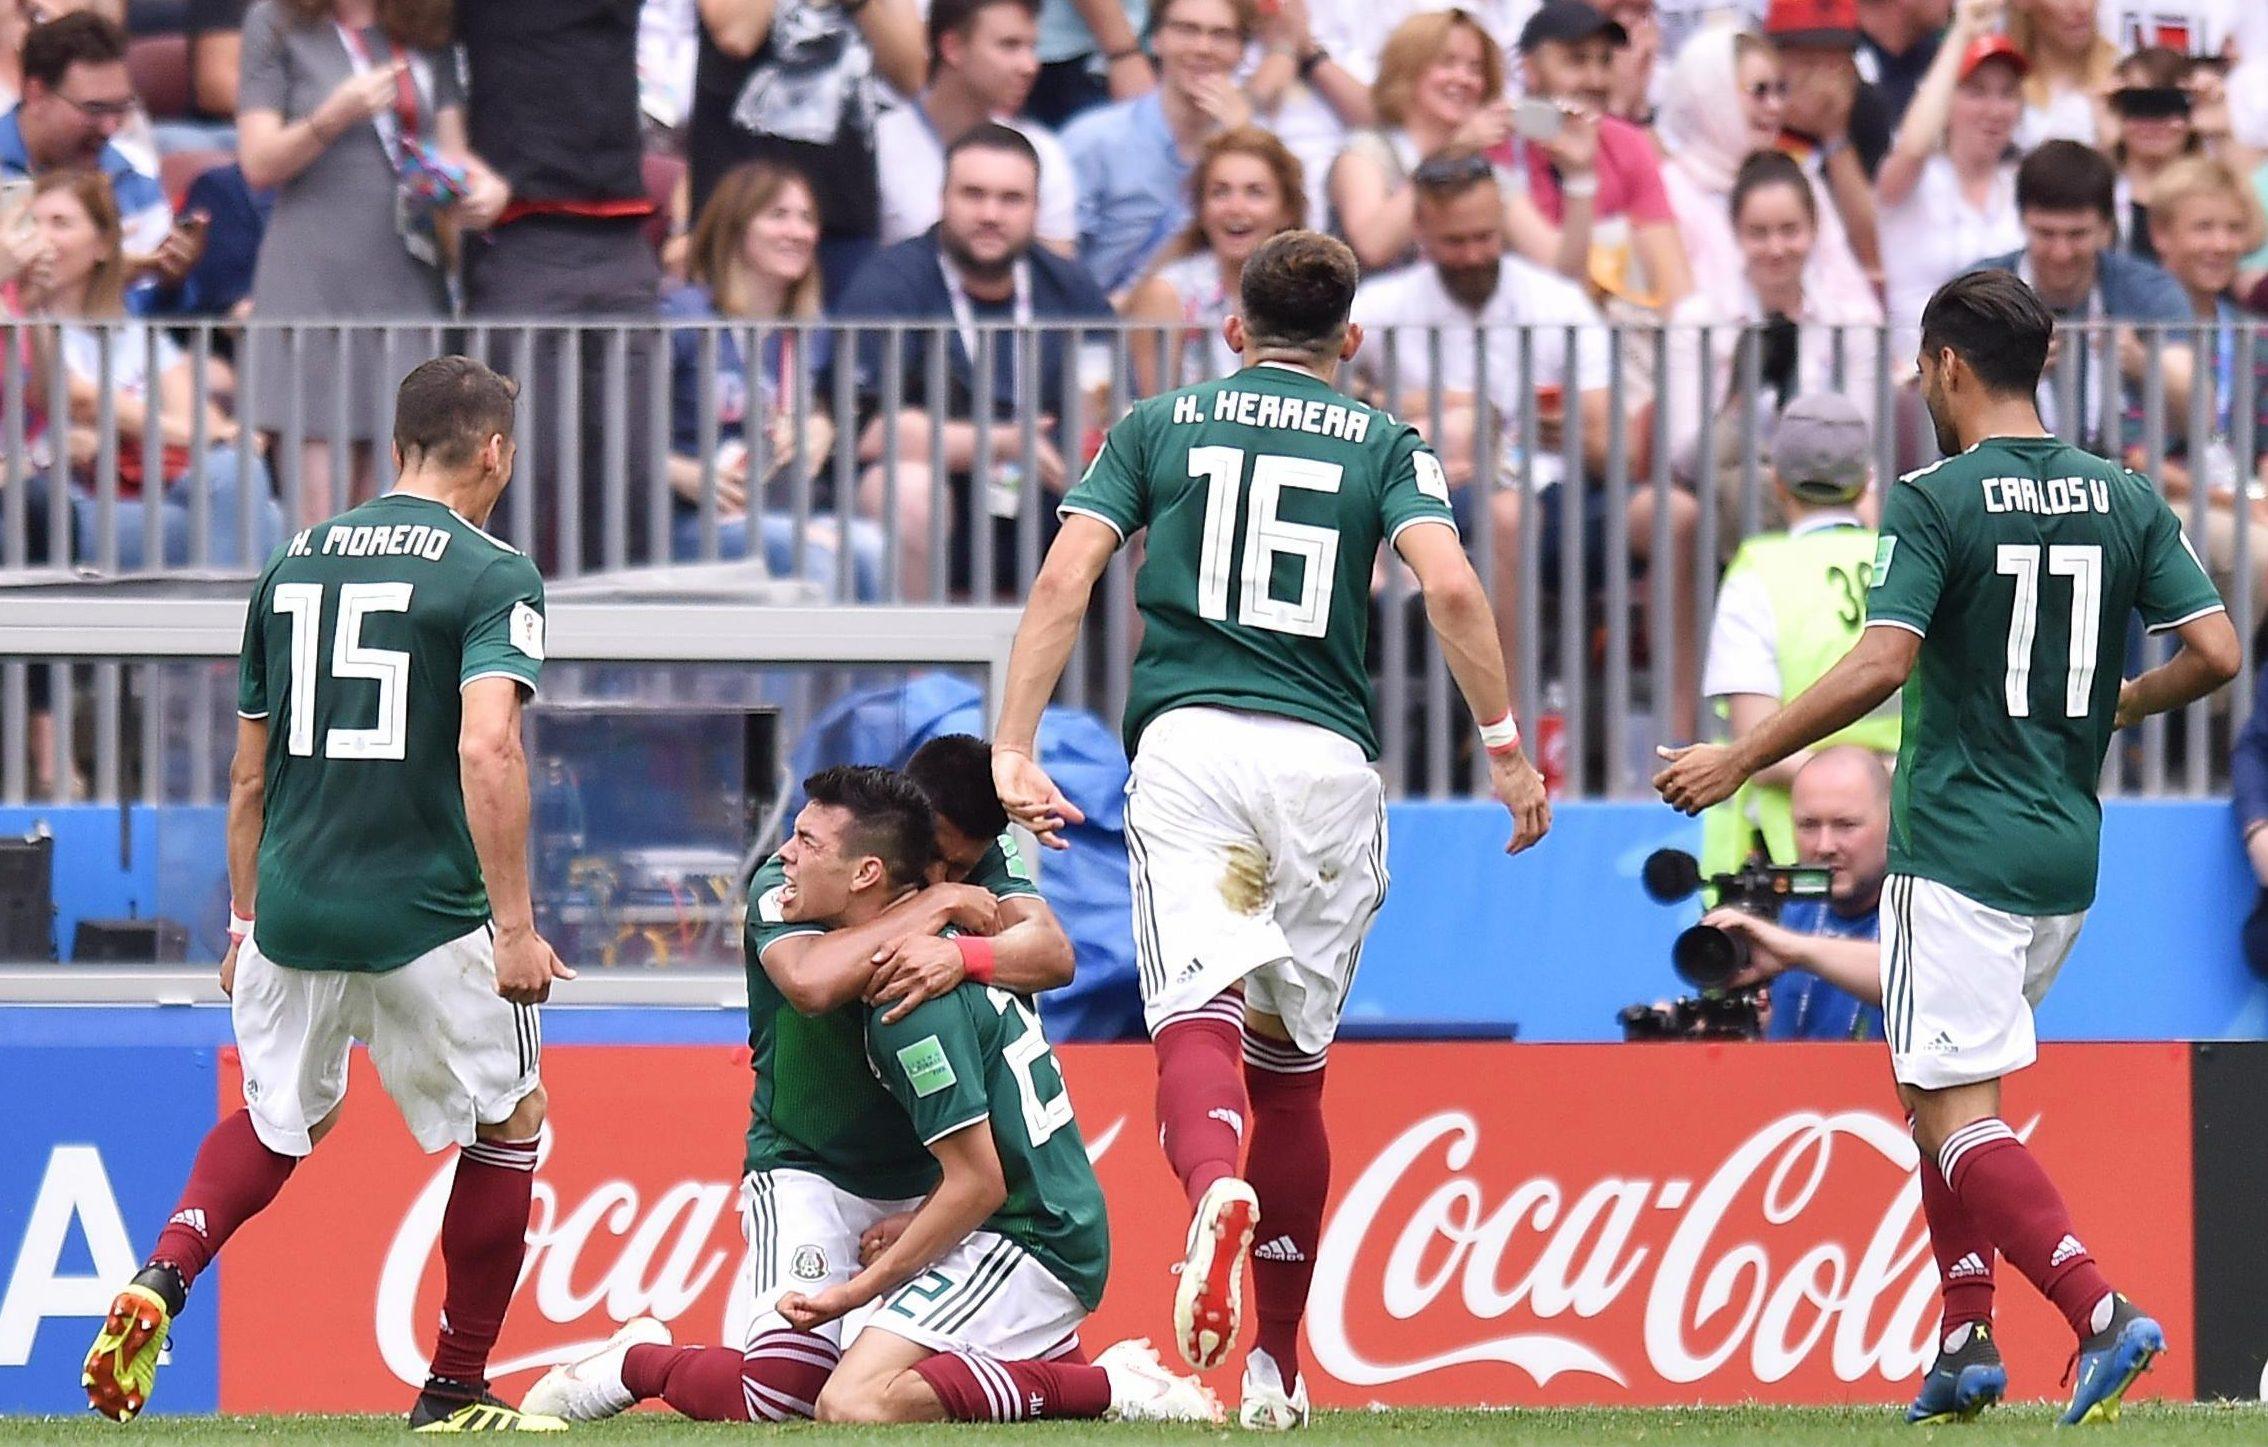 Lozano was the match winner halfway through the first half